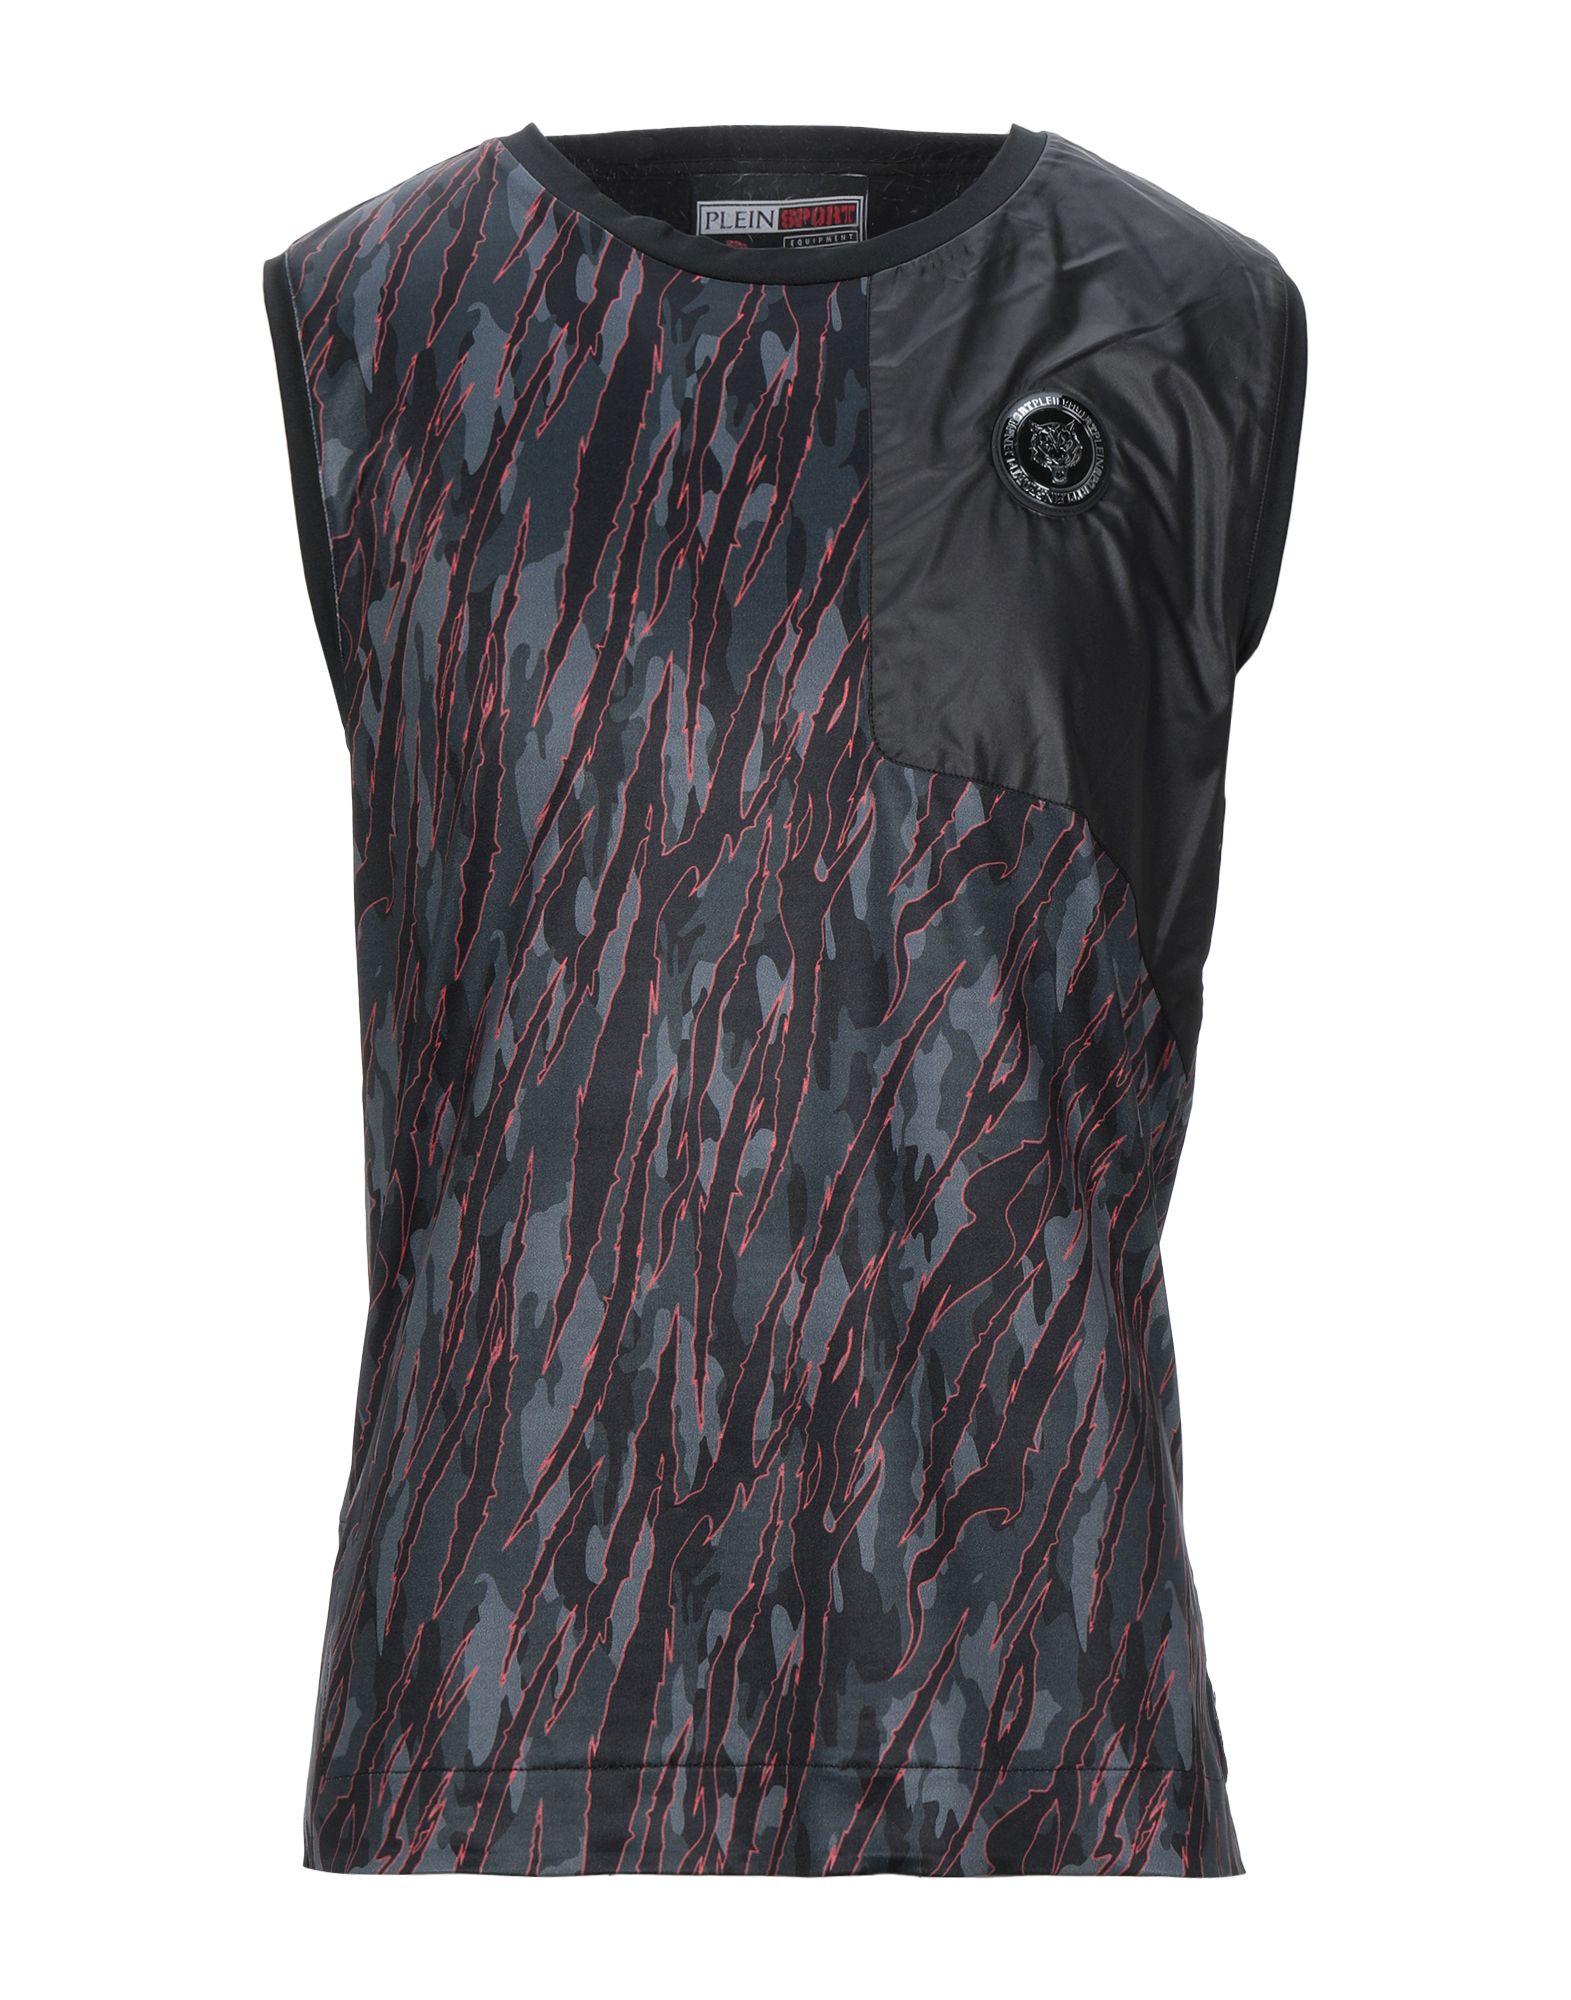 PLEIN SPORT プレイン・スポーツ メンズ T シャツ ブラック